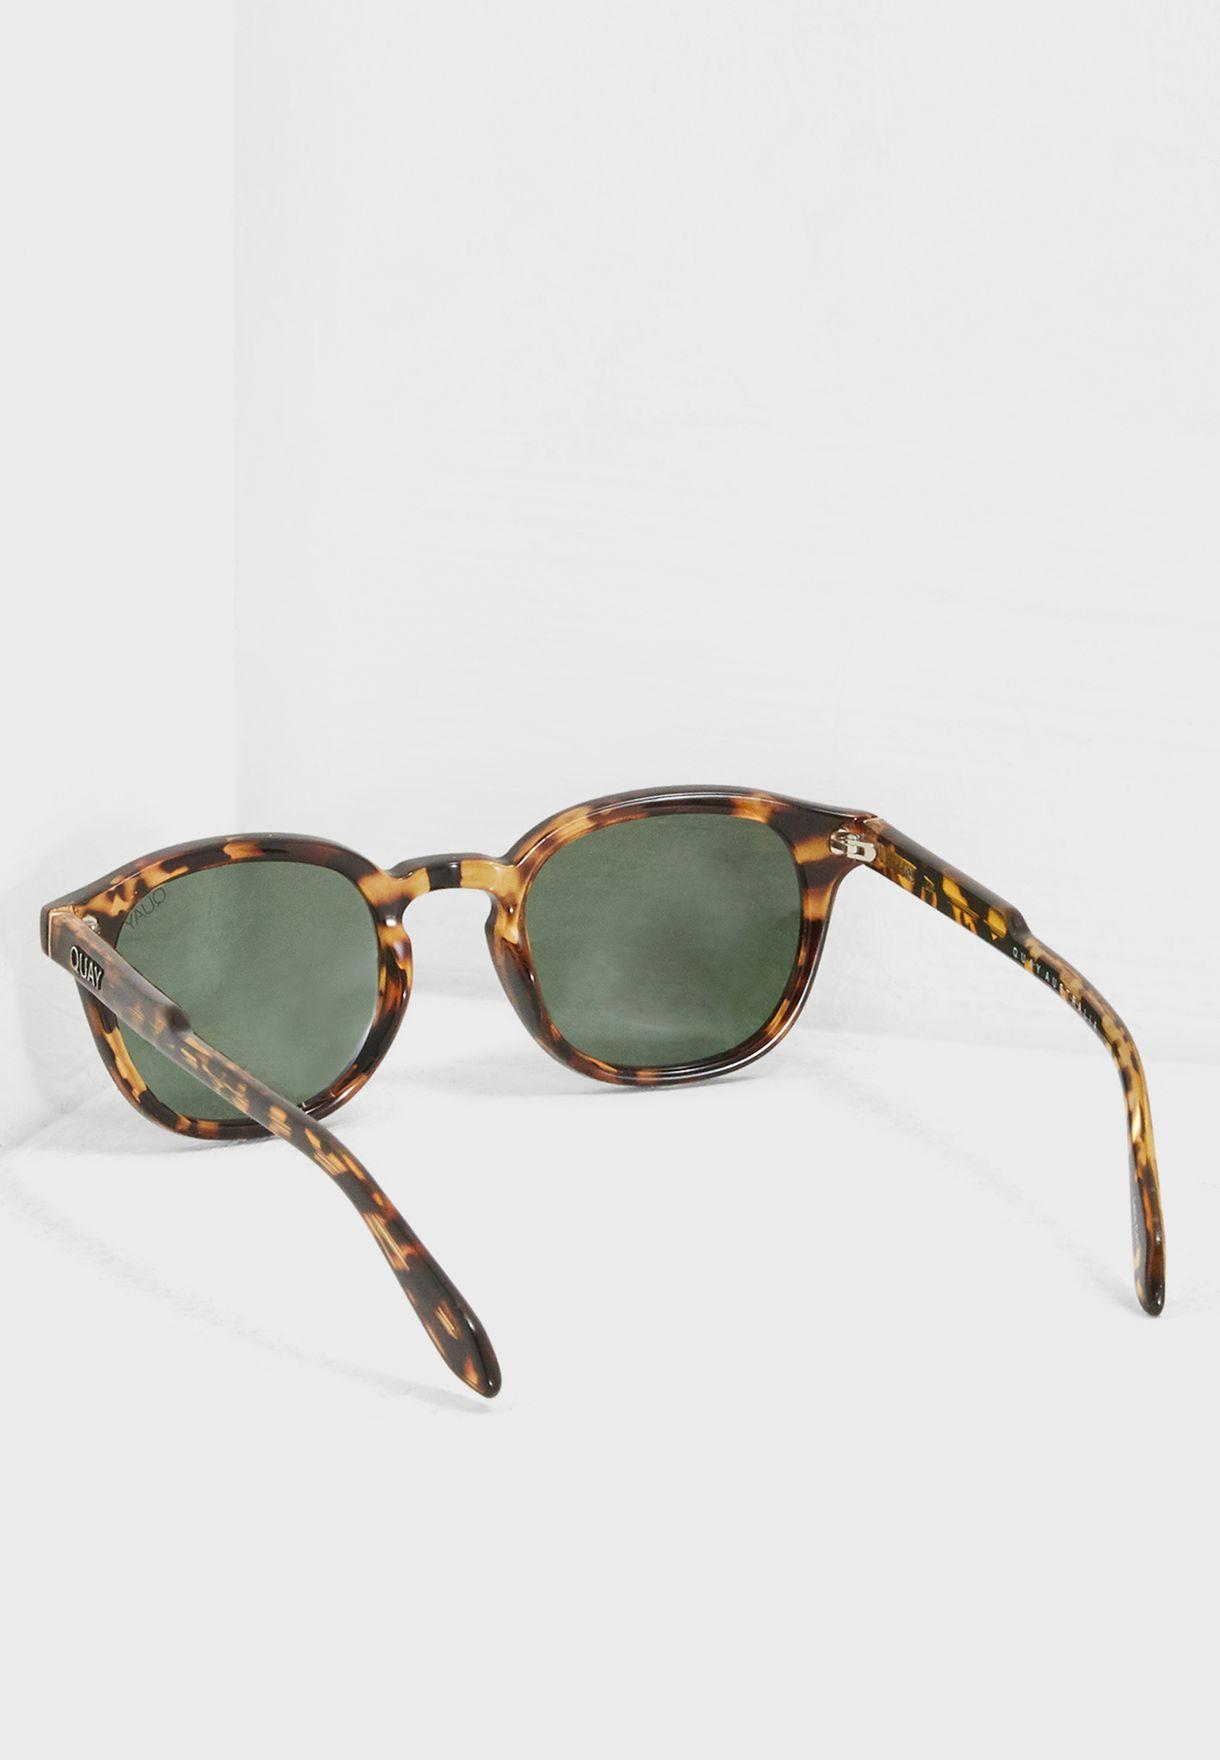 Walk On Sunglasses